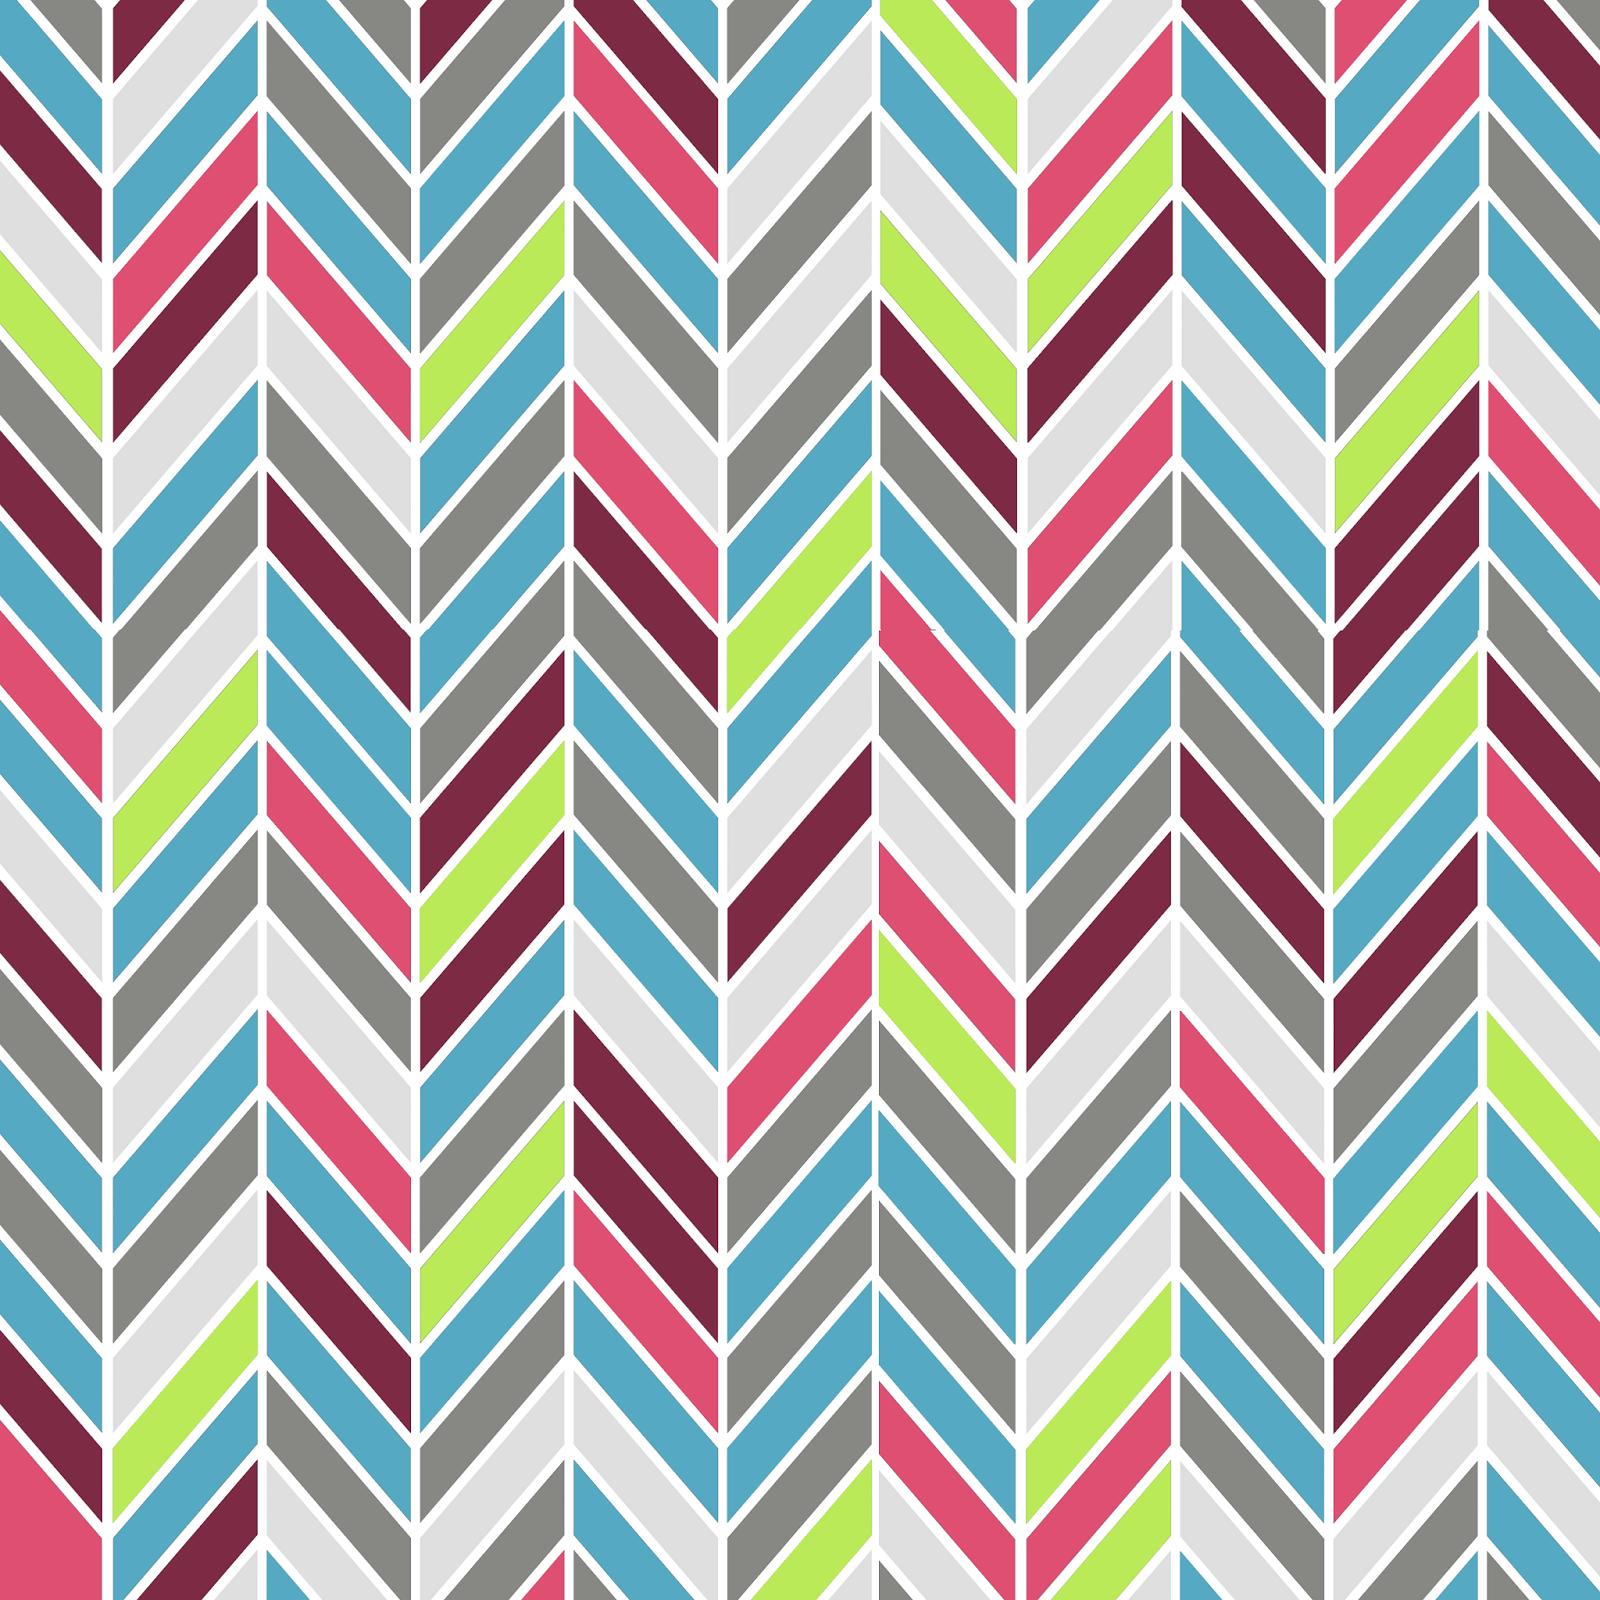 chevron pattern svg - HD1600×1600